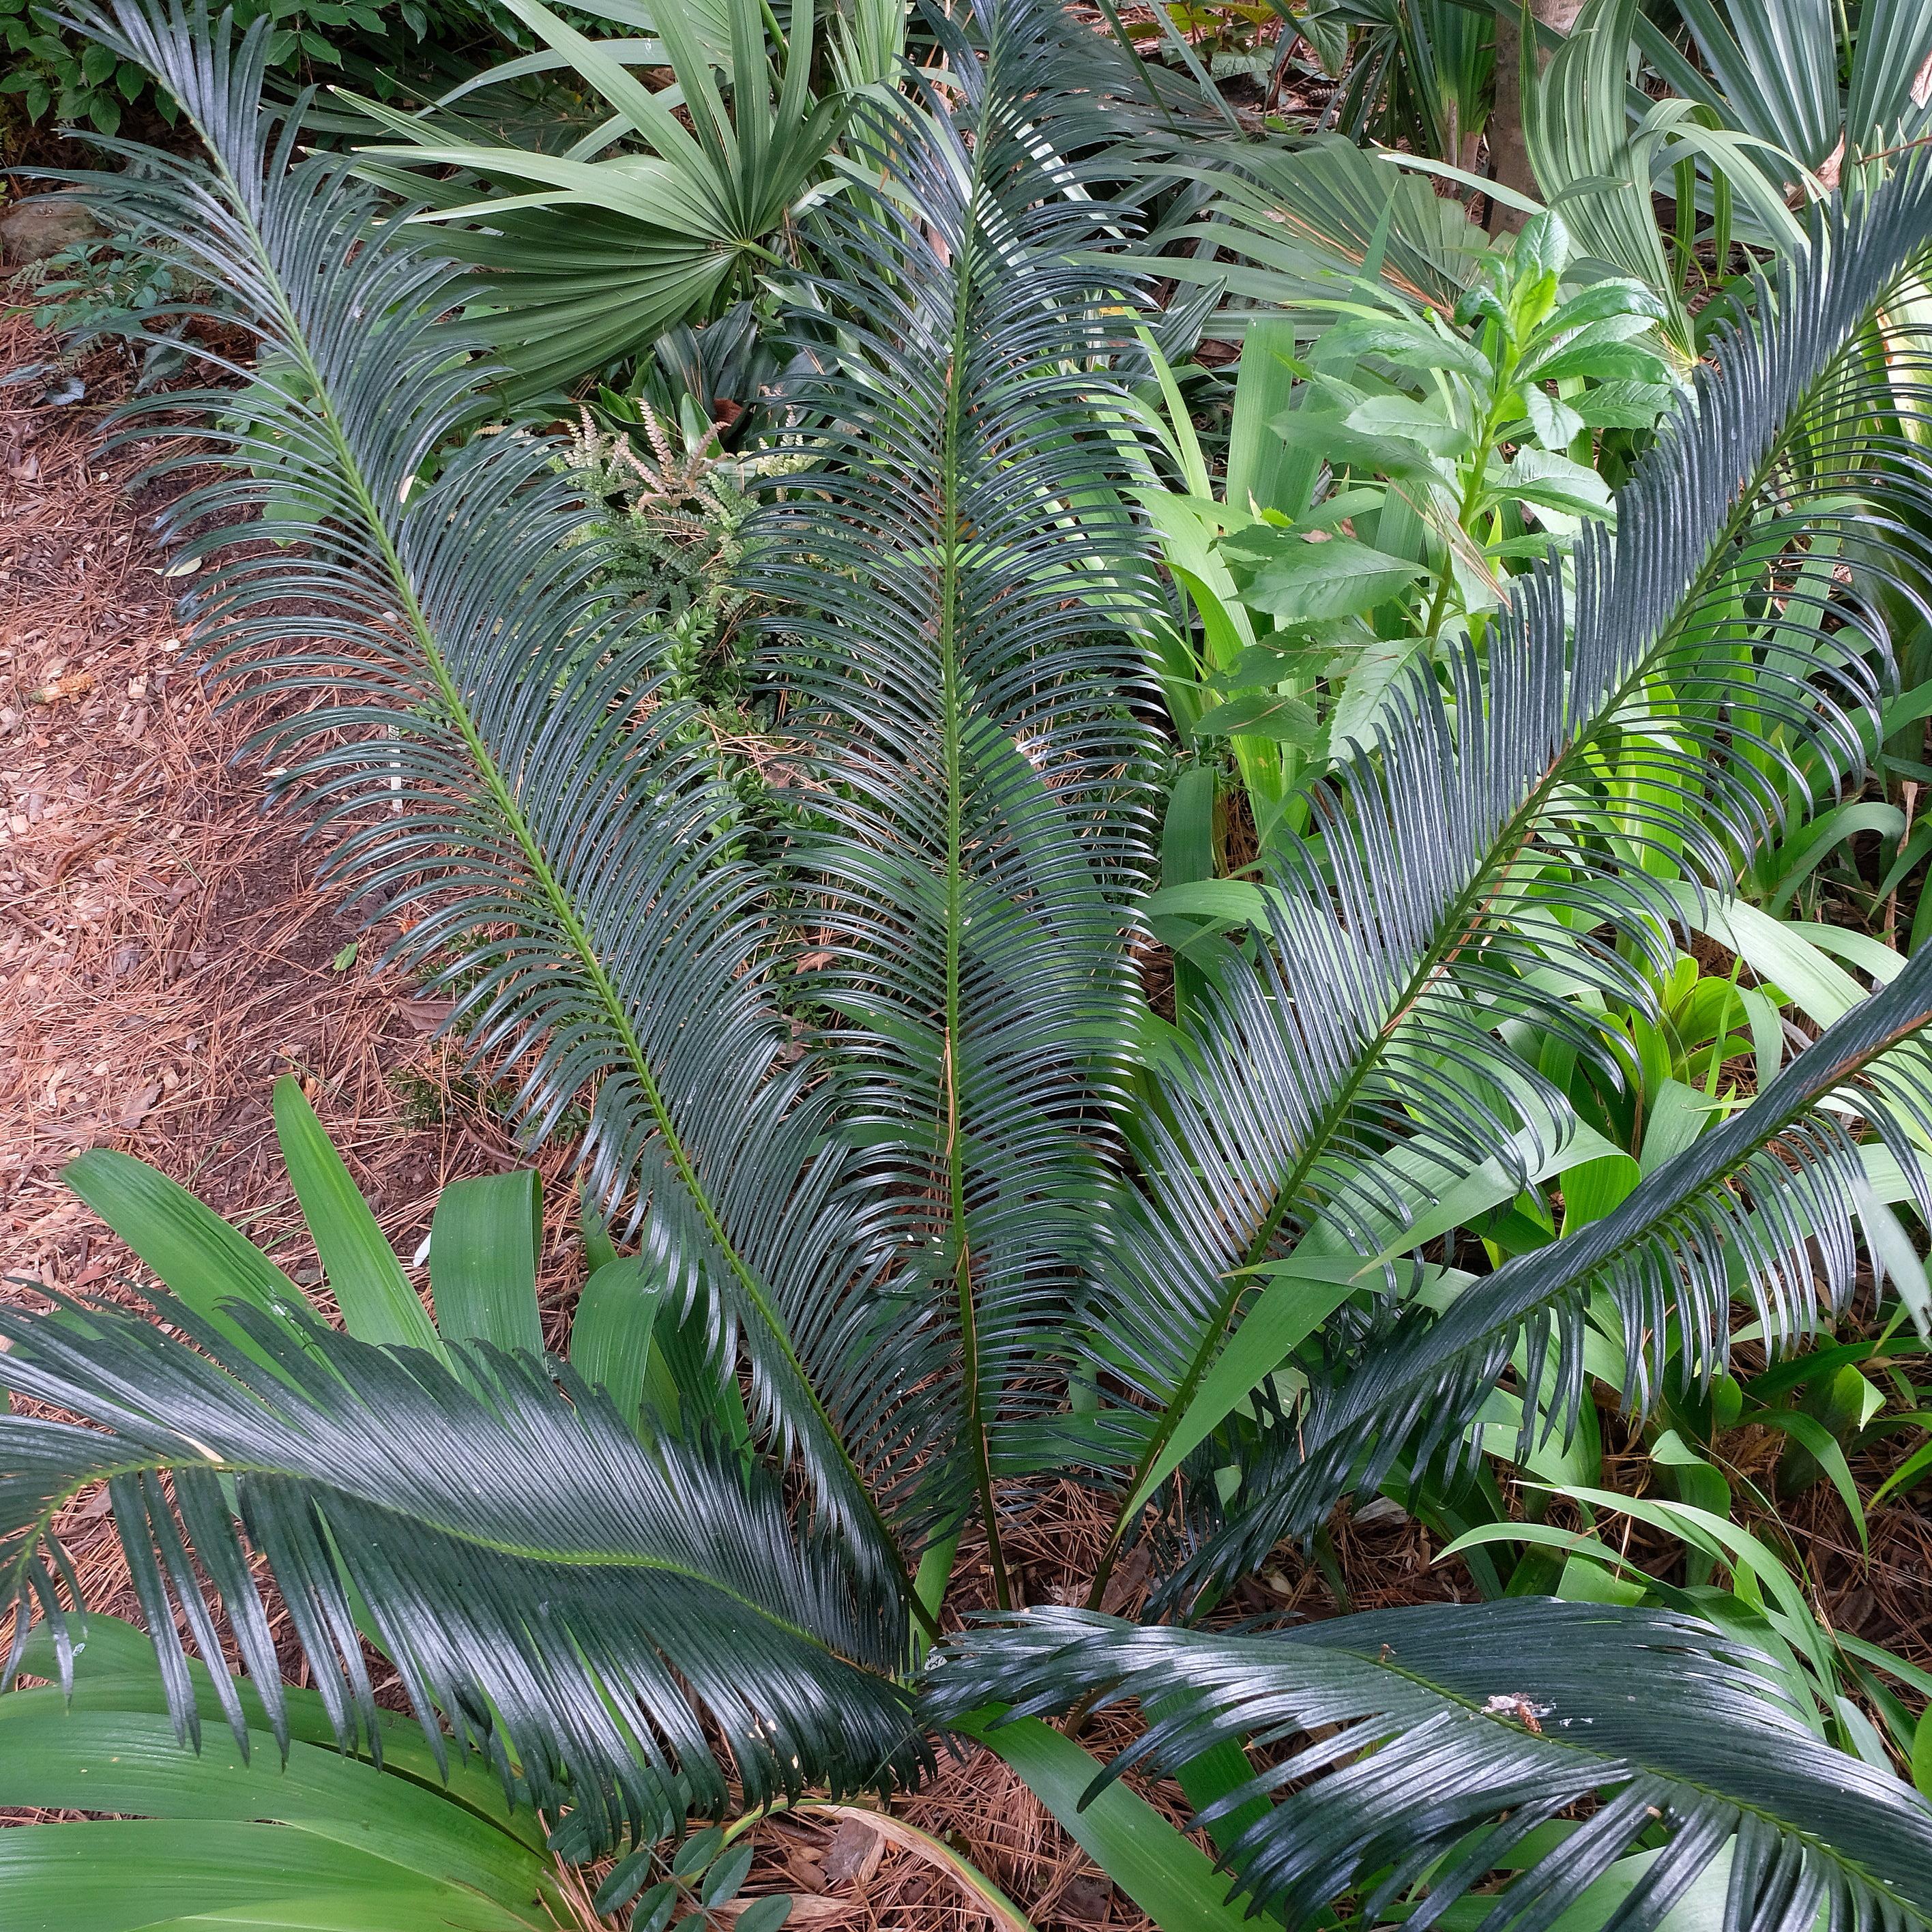 Cycas panzhihuaensis @ JLBG; planted spring 2009